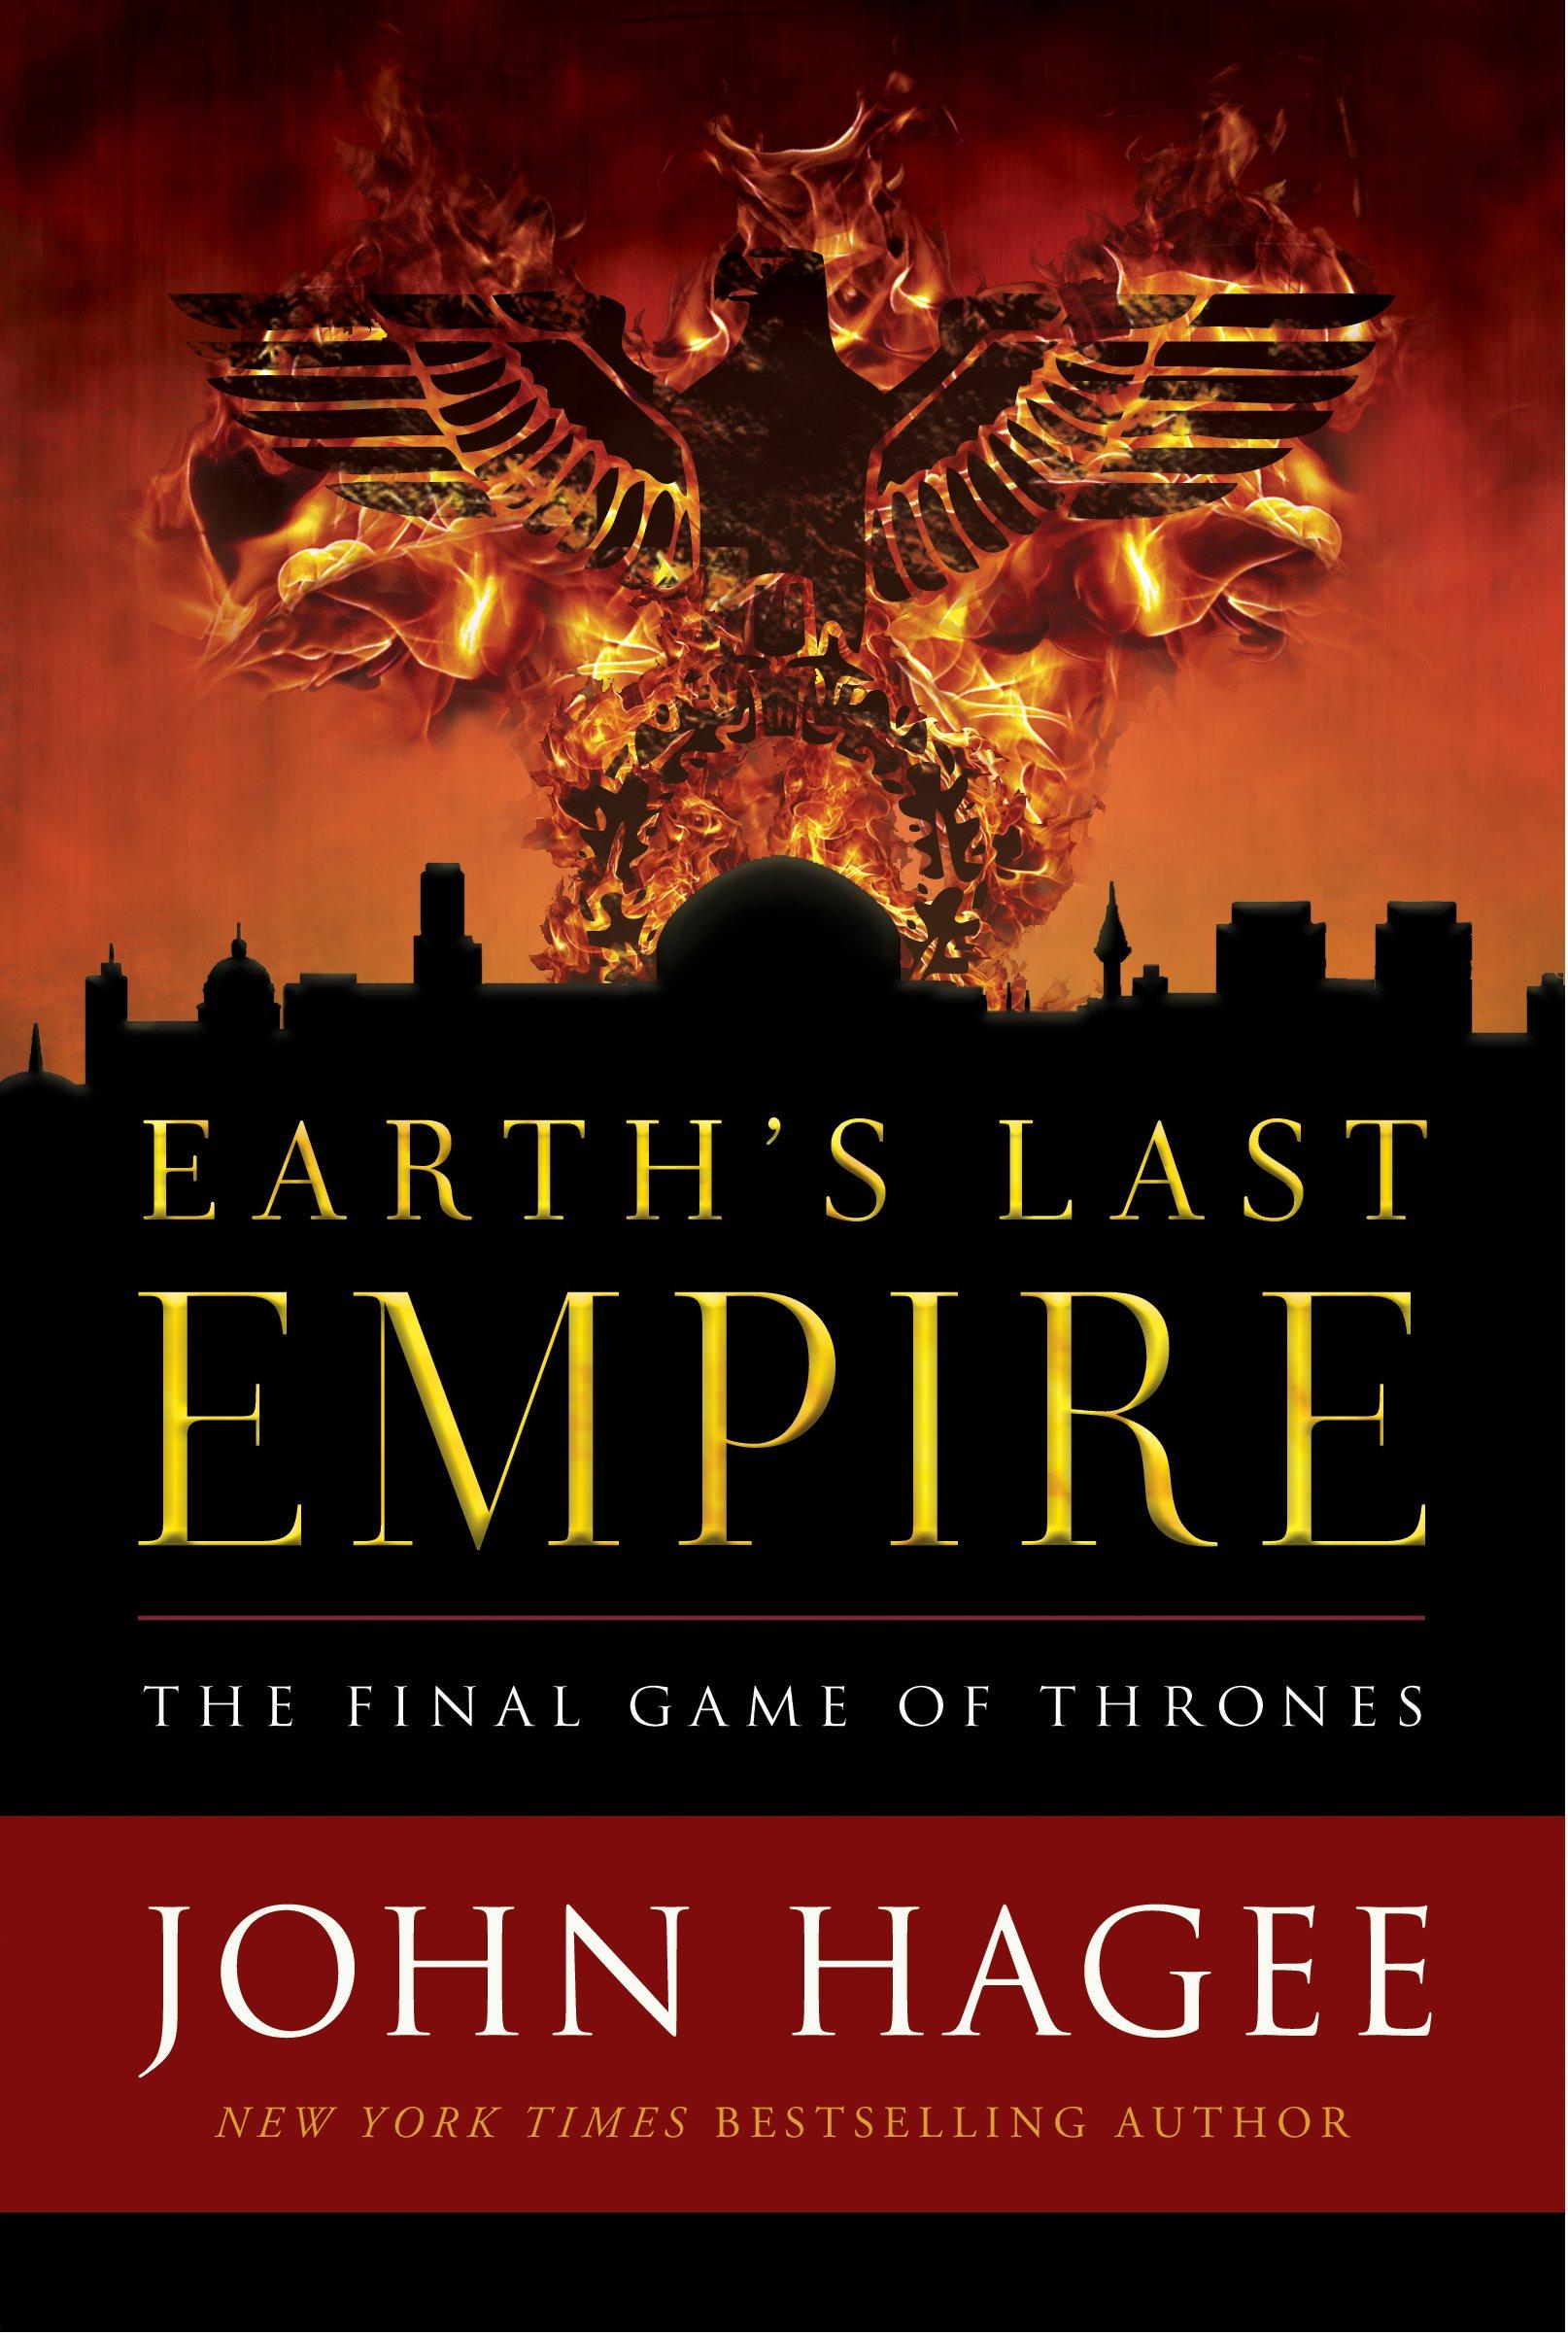 Amazon earths last empire the final game of thrones amazon earths last empire the final game of thrones 9781683972761 john hagee books malvernweather Choice Image